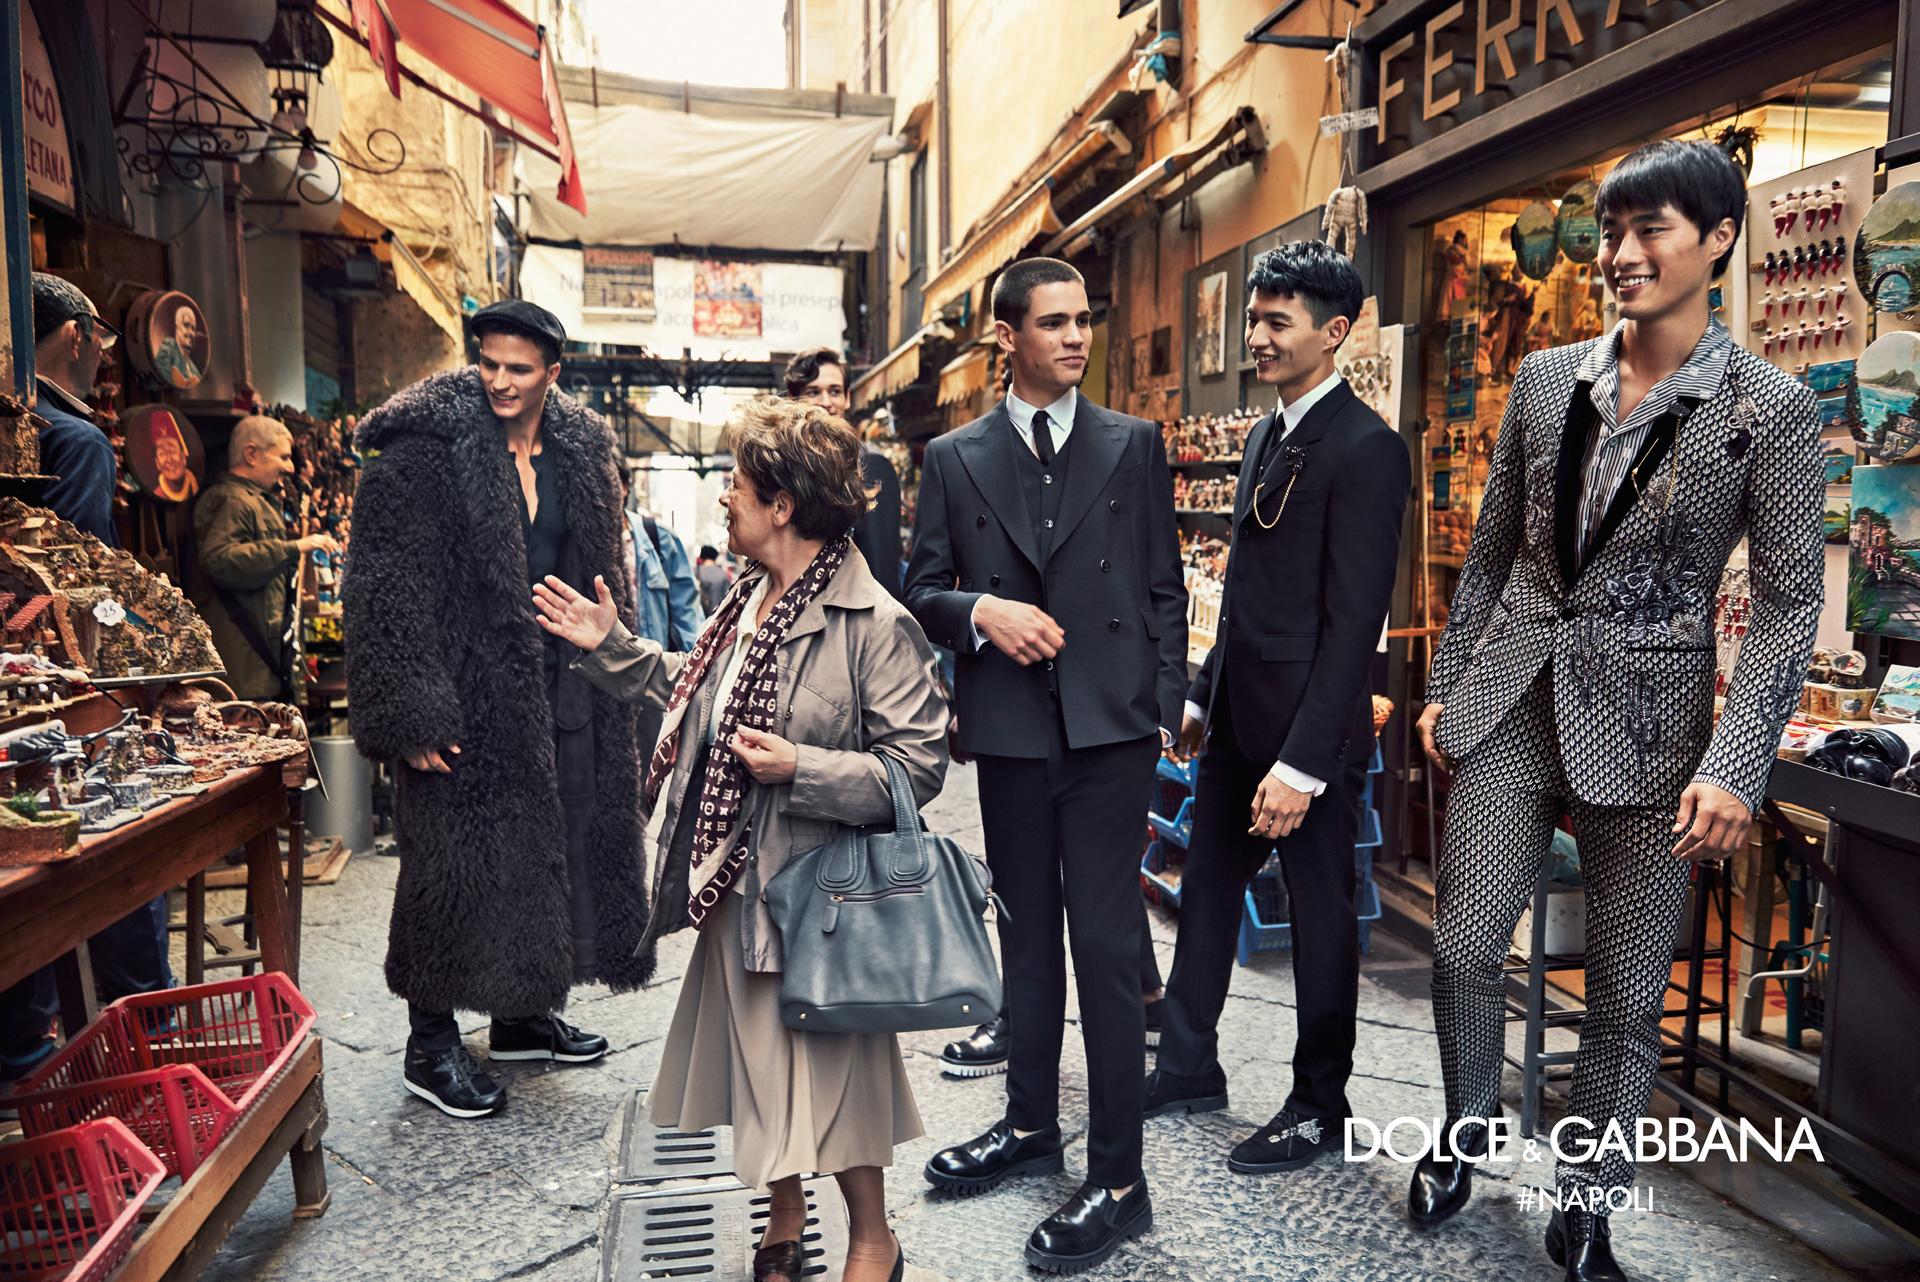 Dolce-Gabbana-Fall-Winter-2016-2017-Ad-Campaign-Naples-2